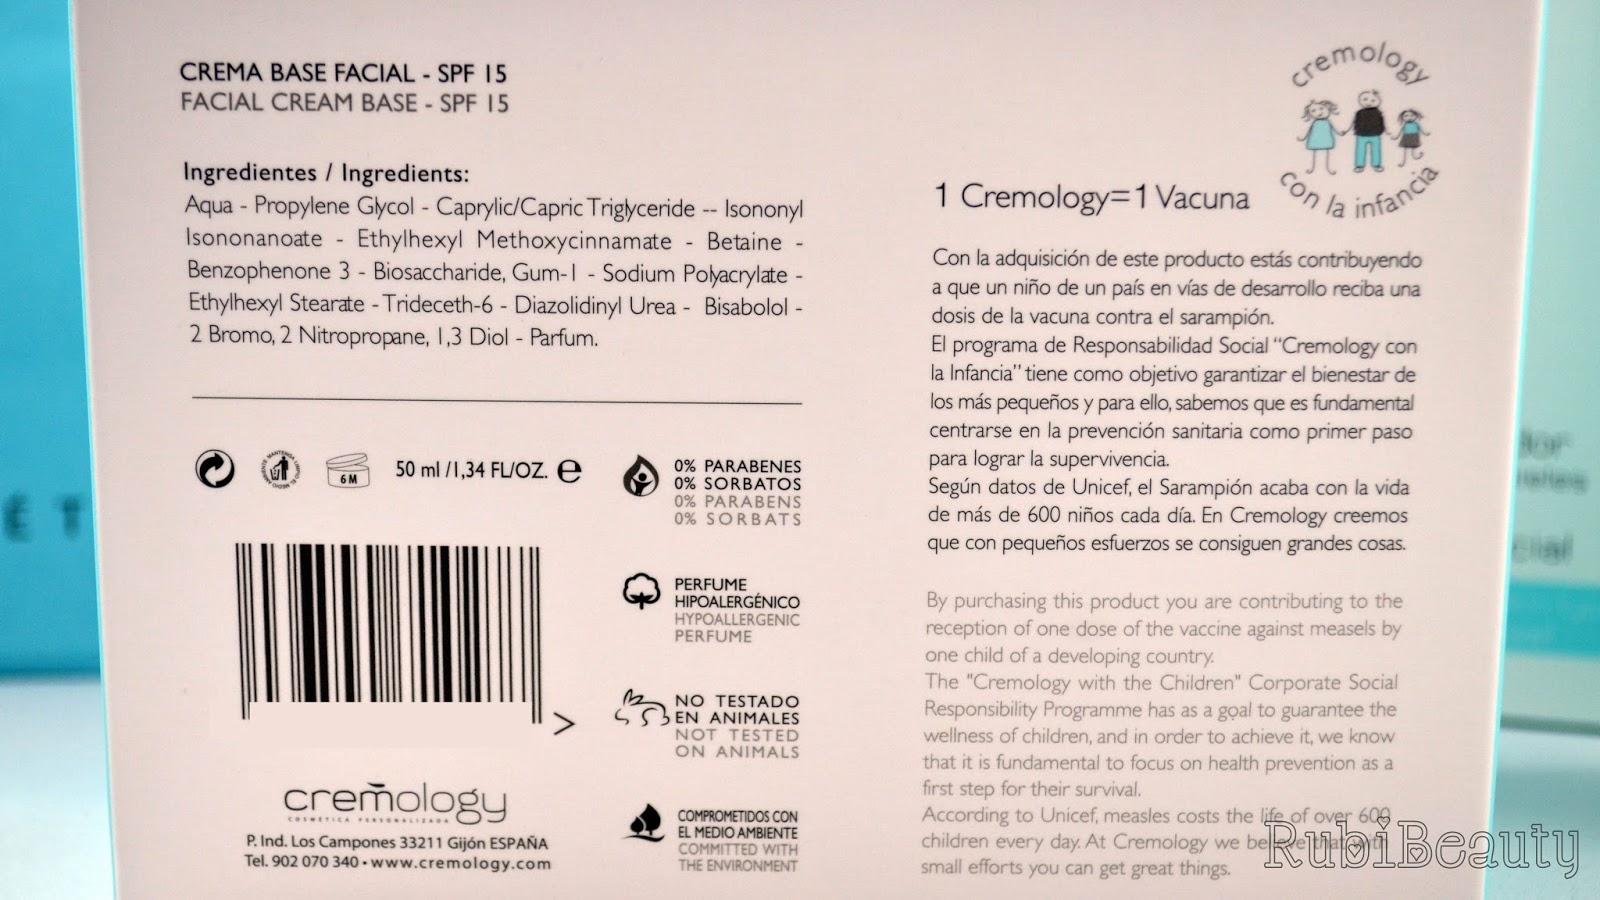 rubibeauty review opinion cremology crema rutina facial personalizada ingredientes